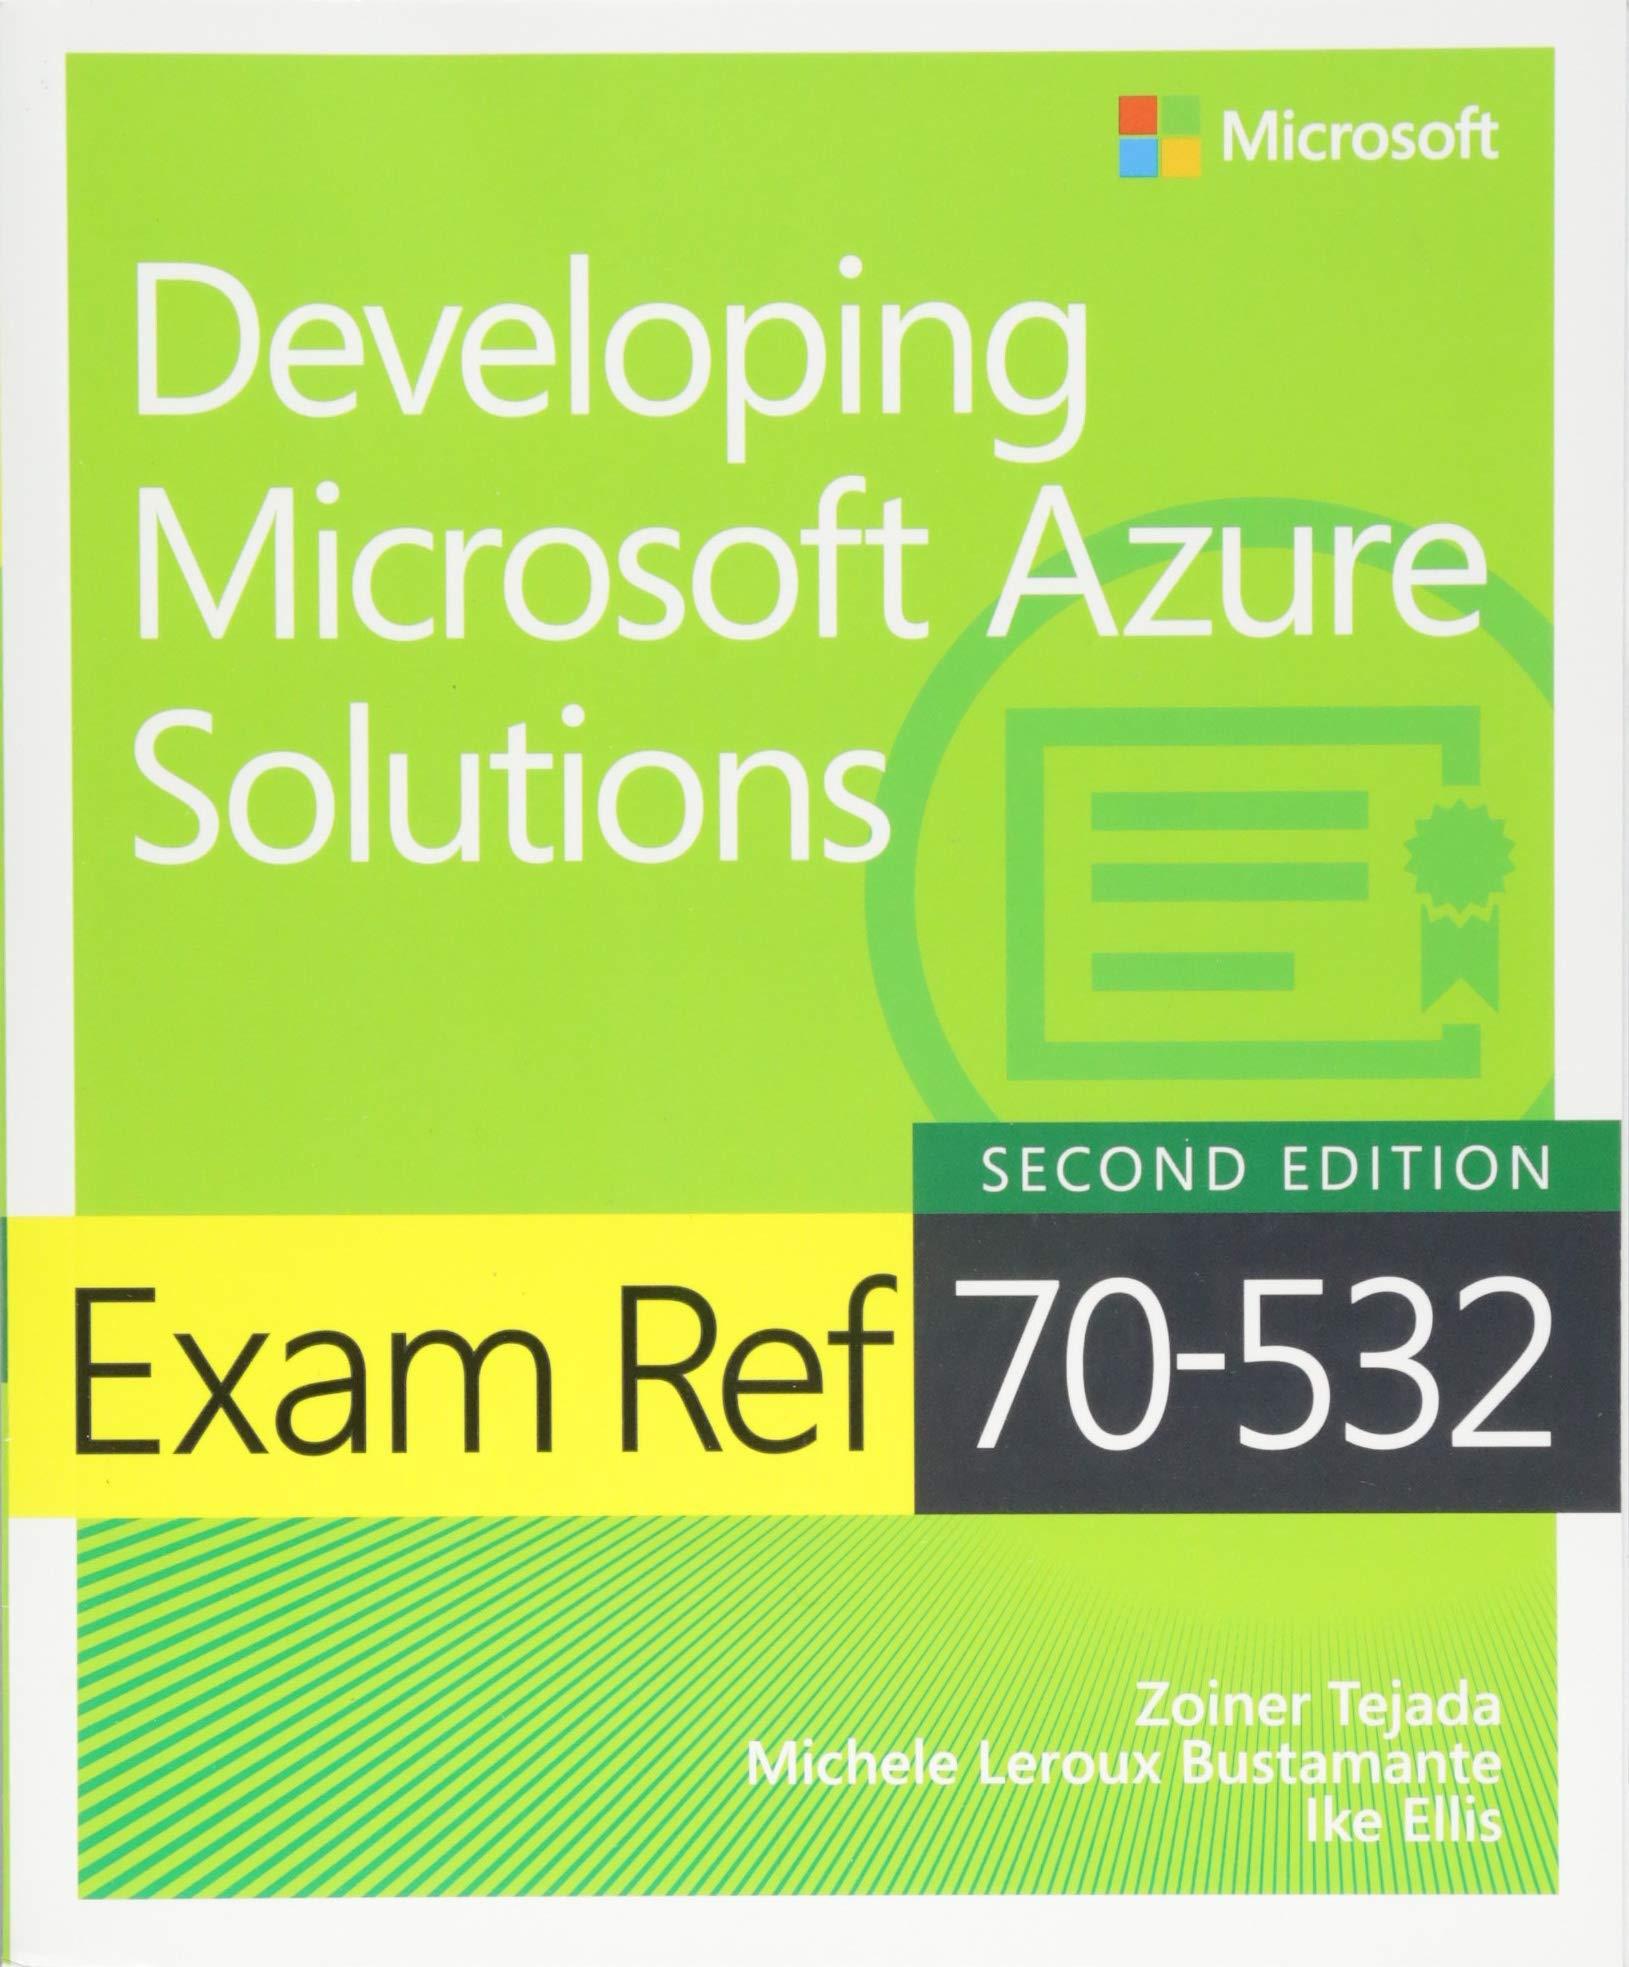 Exam Ref 70-532 Developing Microsoft Azure Solutions